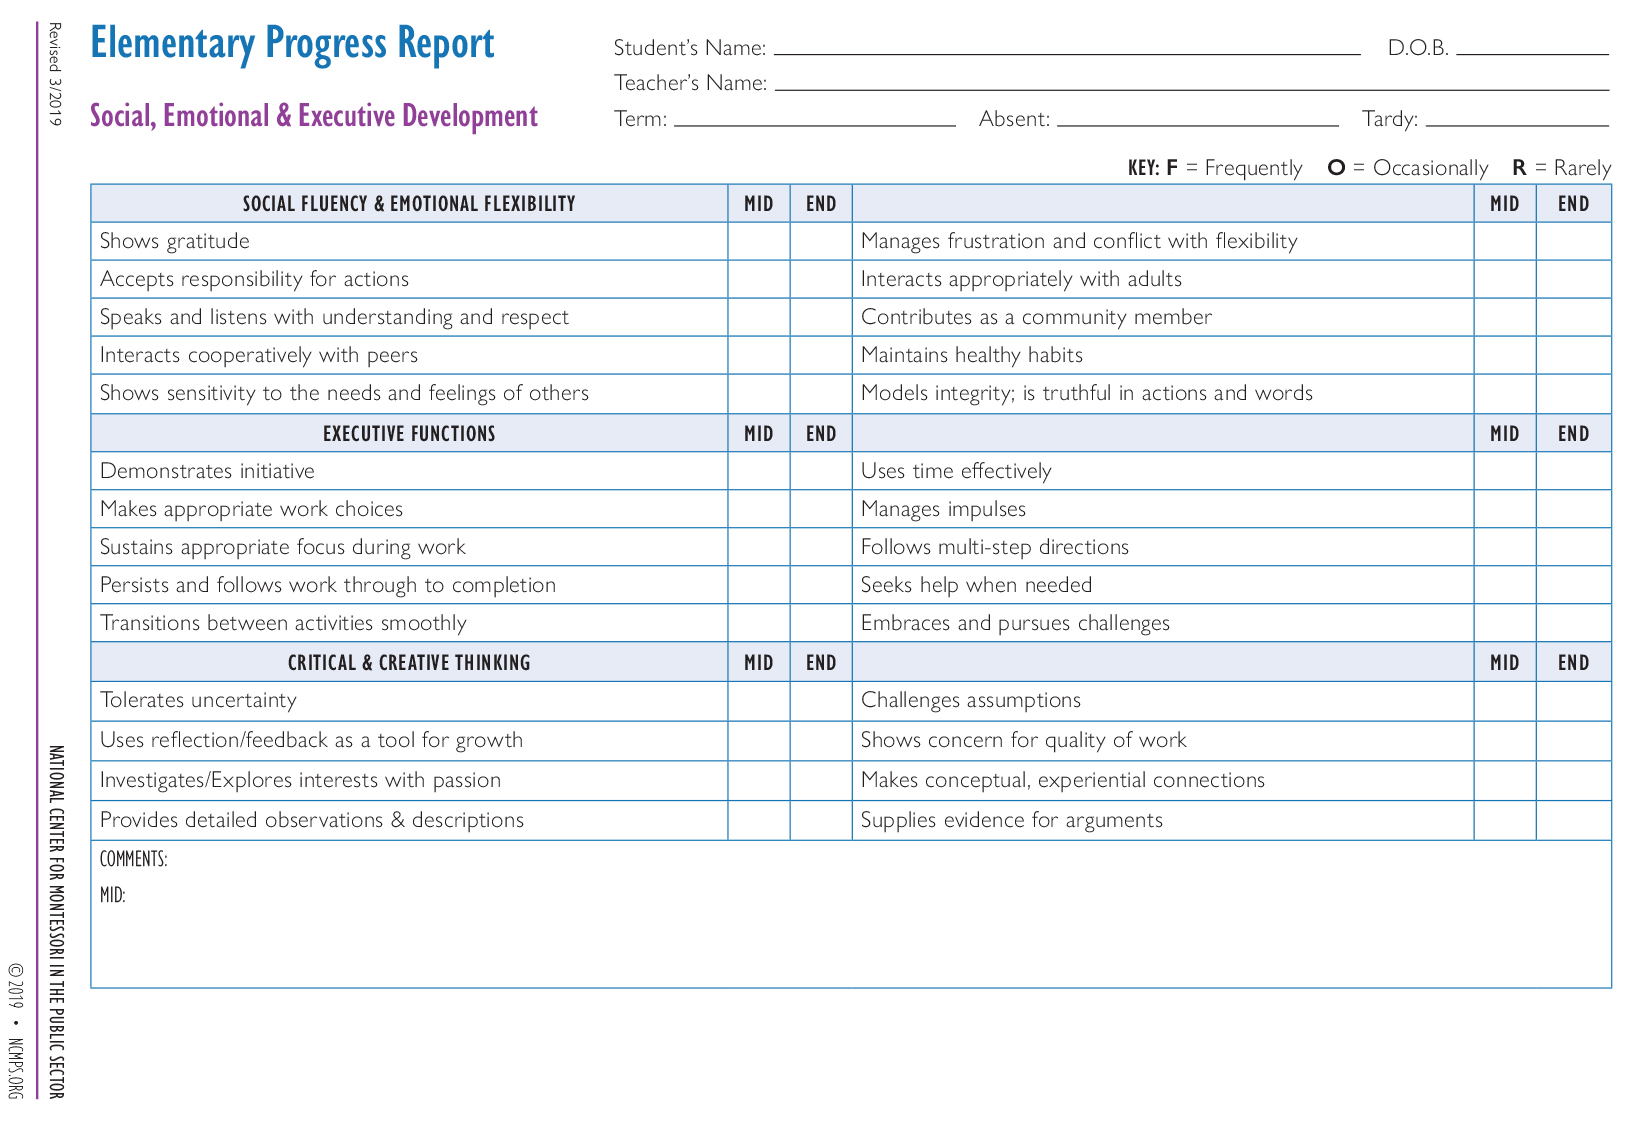 Elementary Progress Report